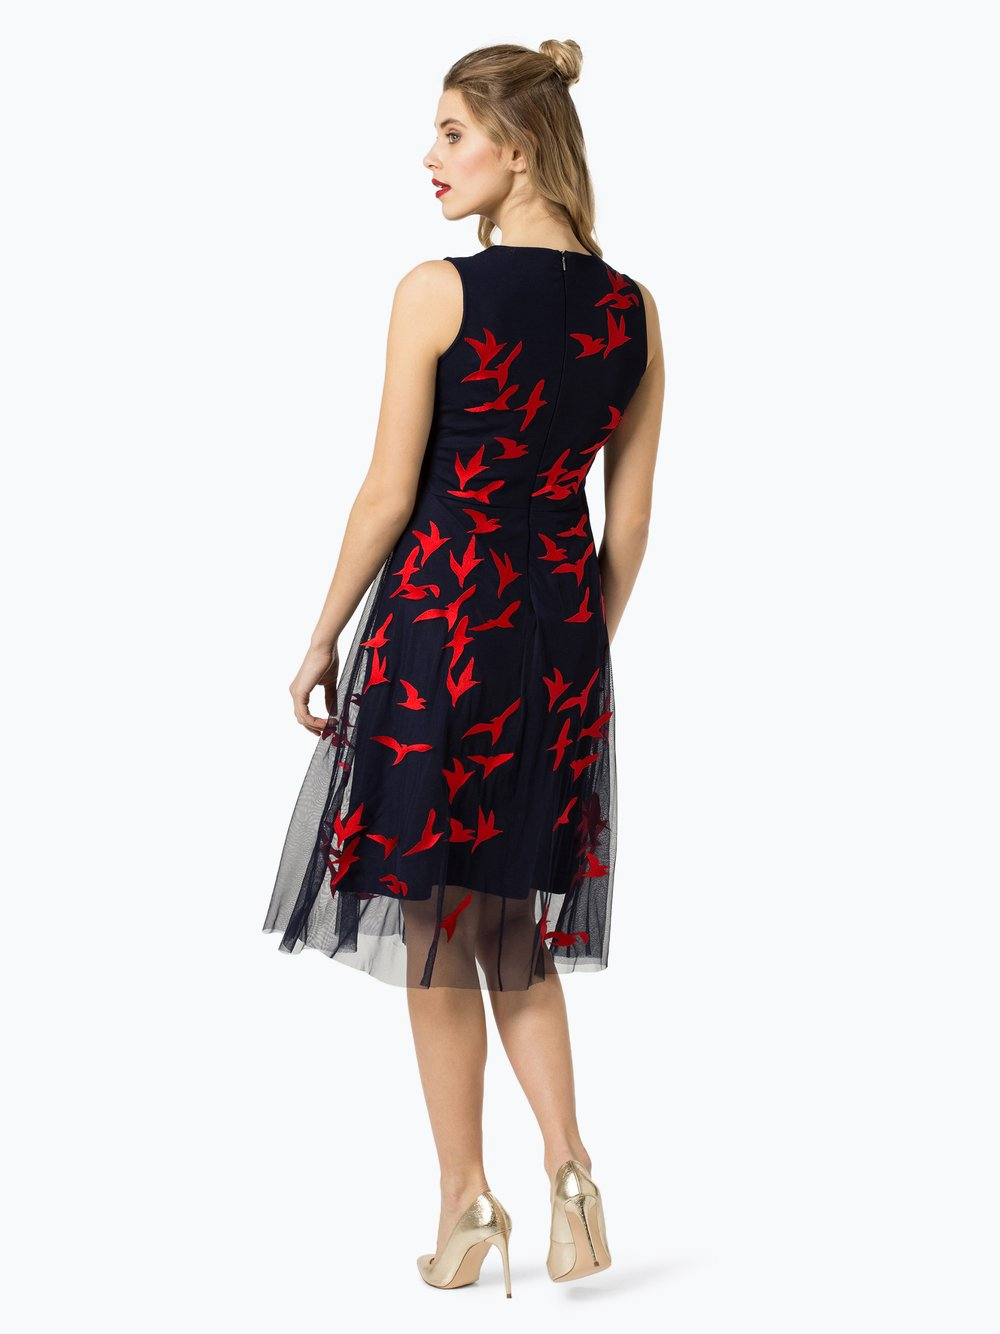 BOSS Damen Kleid - Enerva marine rot gemustert online kaufen | PEEK ...